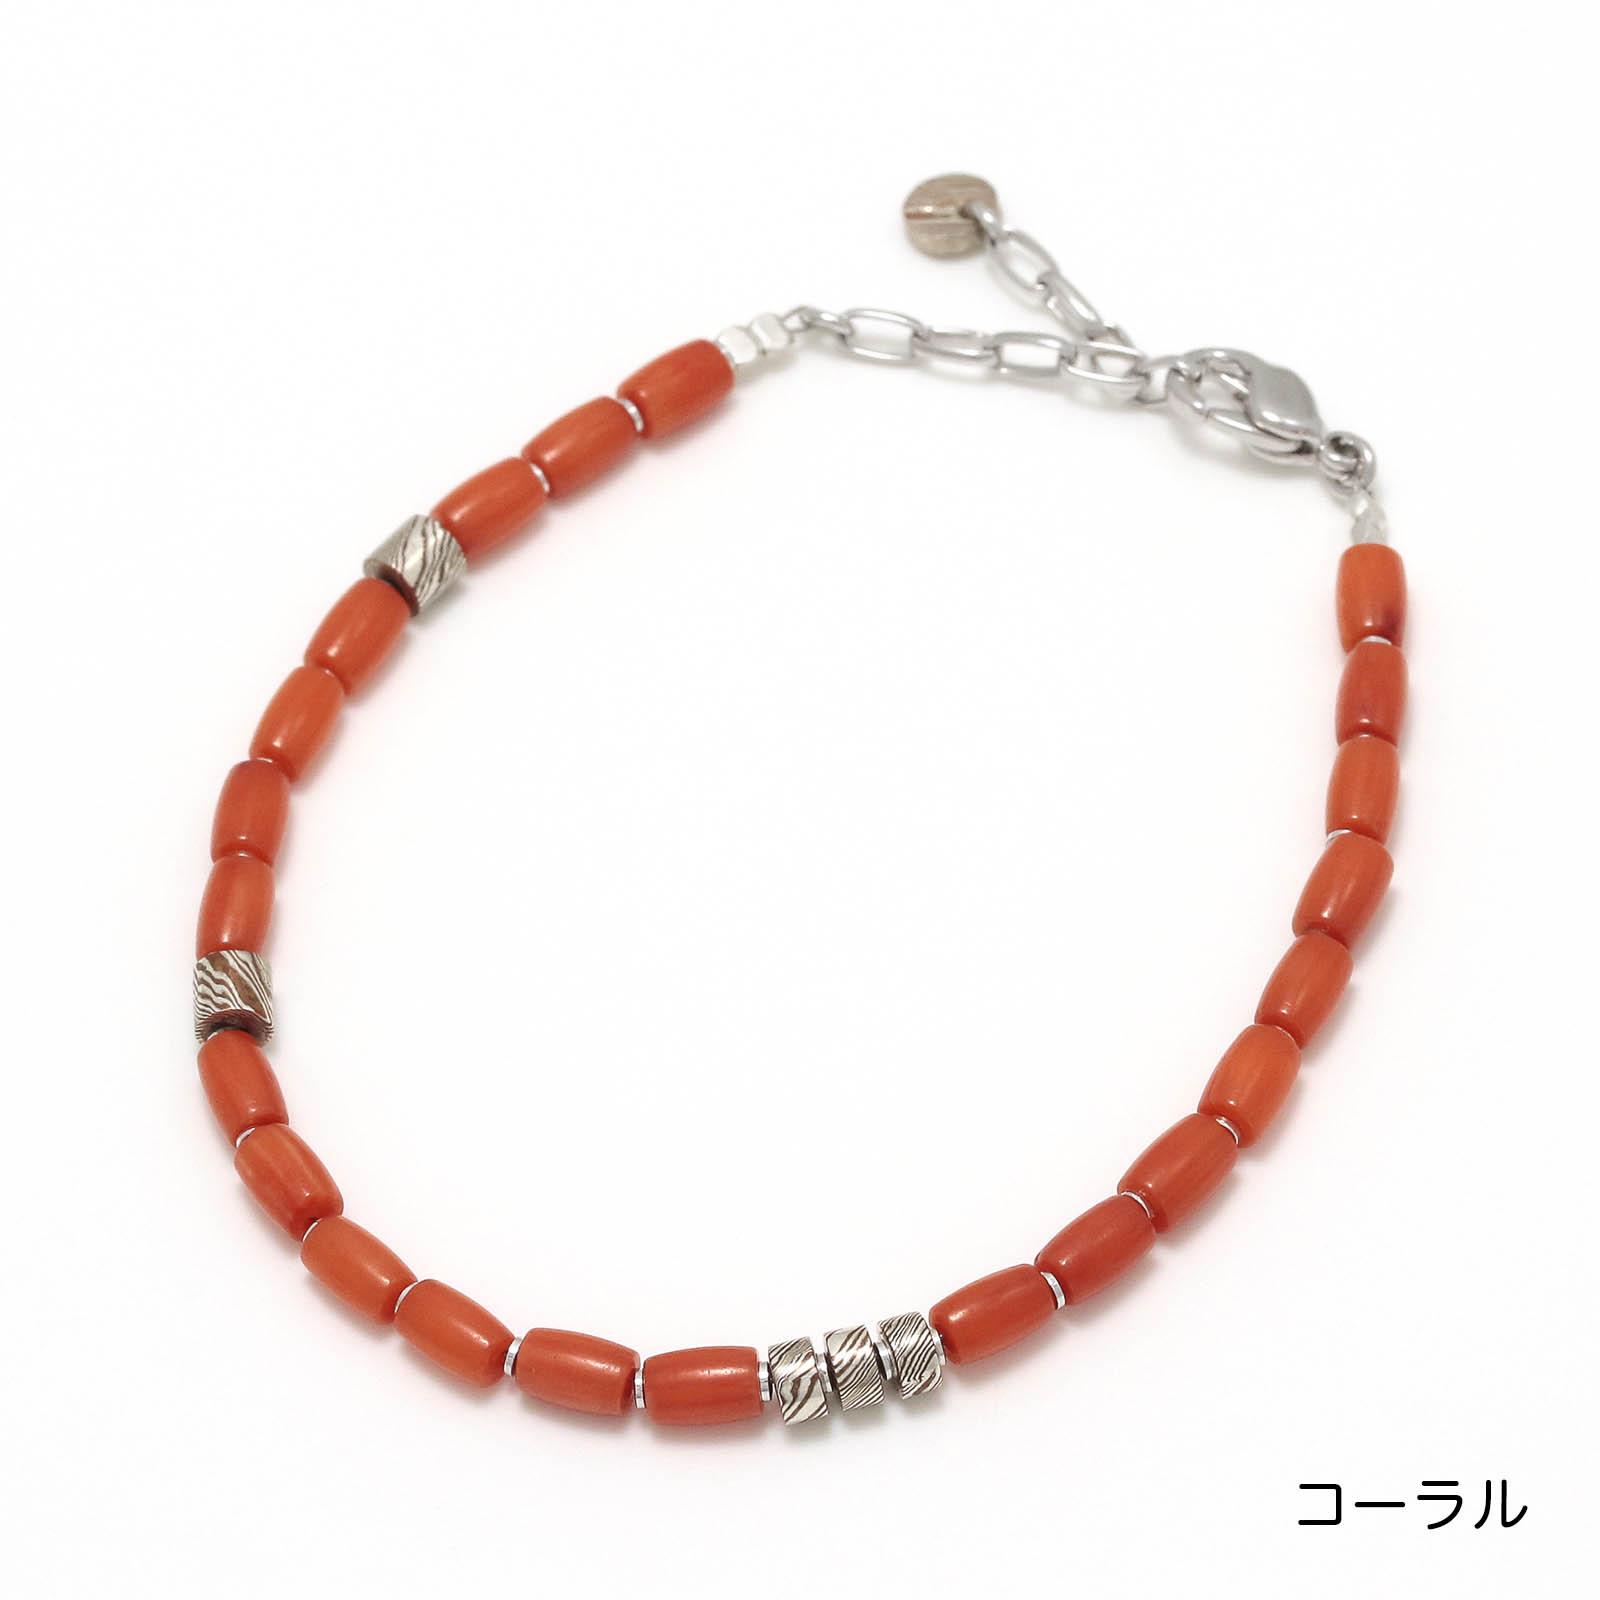 Tube Beads Bracelet - Coral